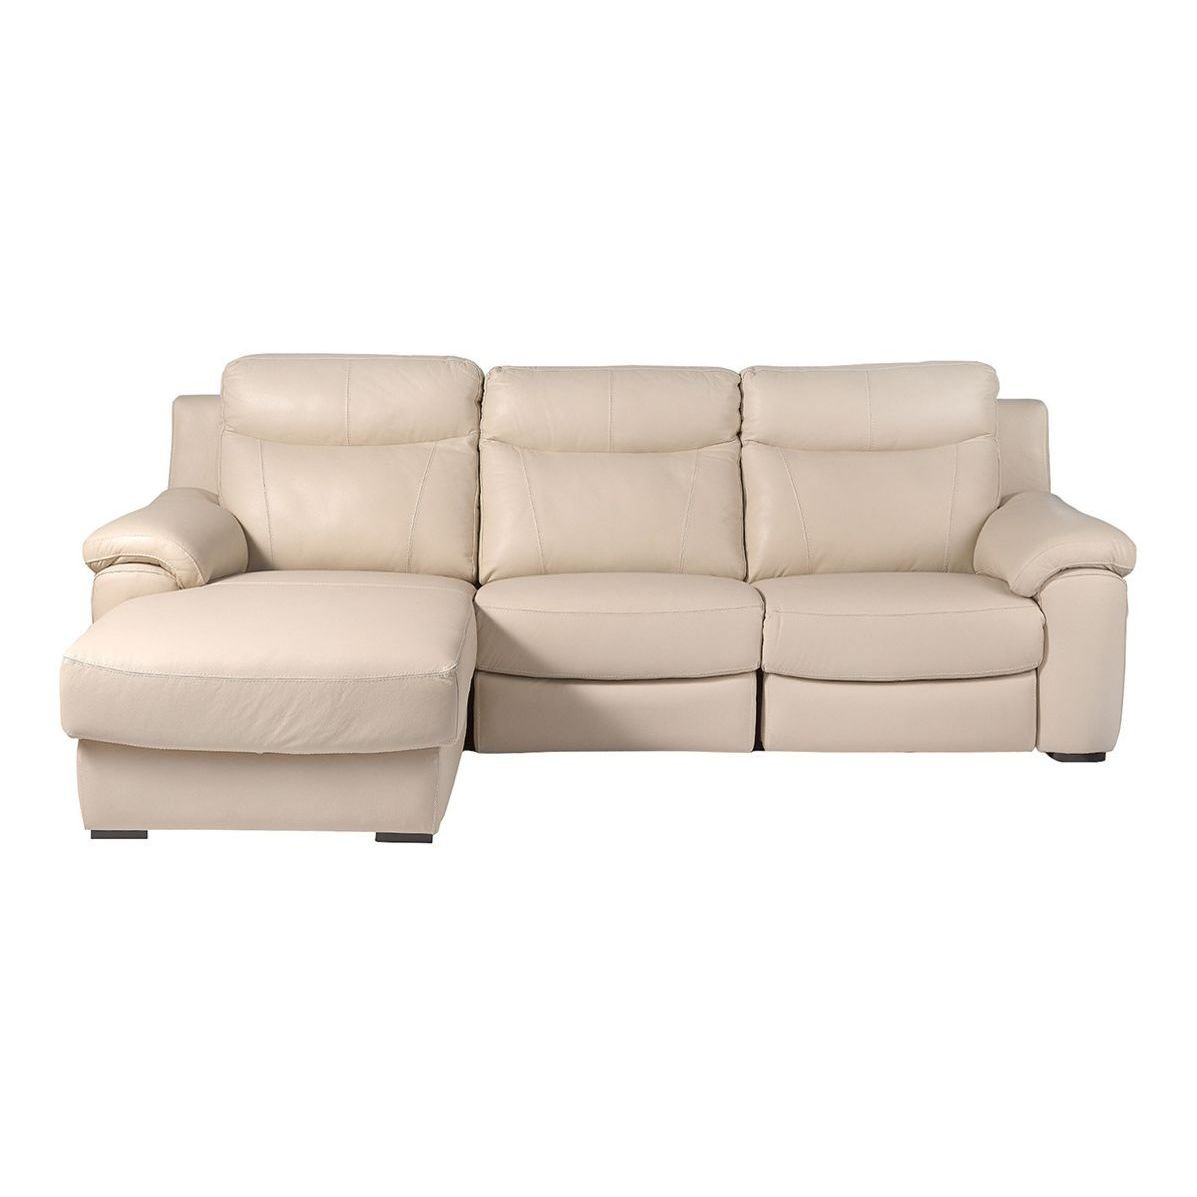 sofa en ingles galaxy sectional sofás chaise longue el corte inglés